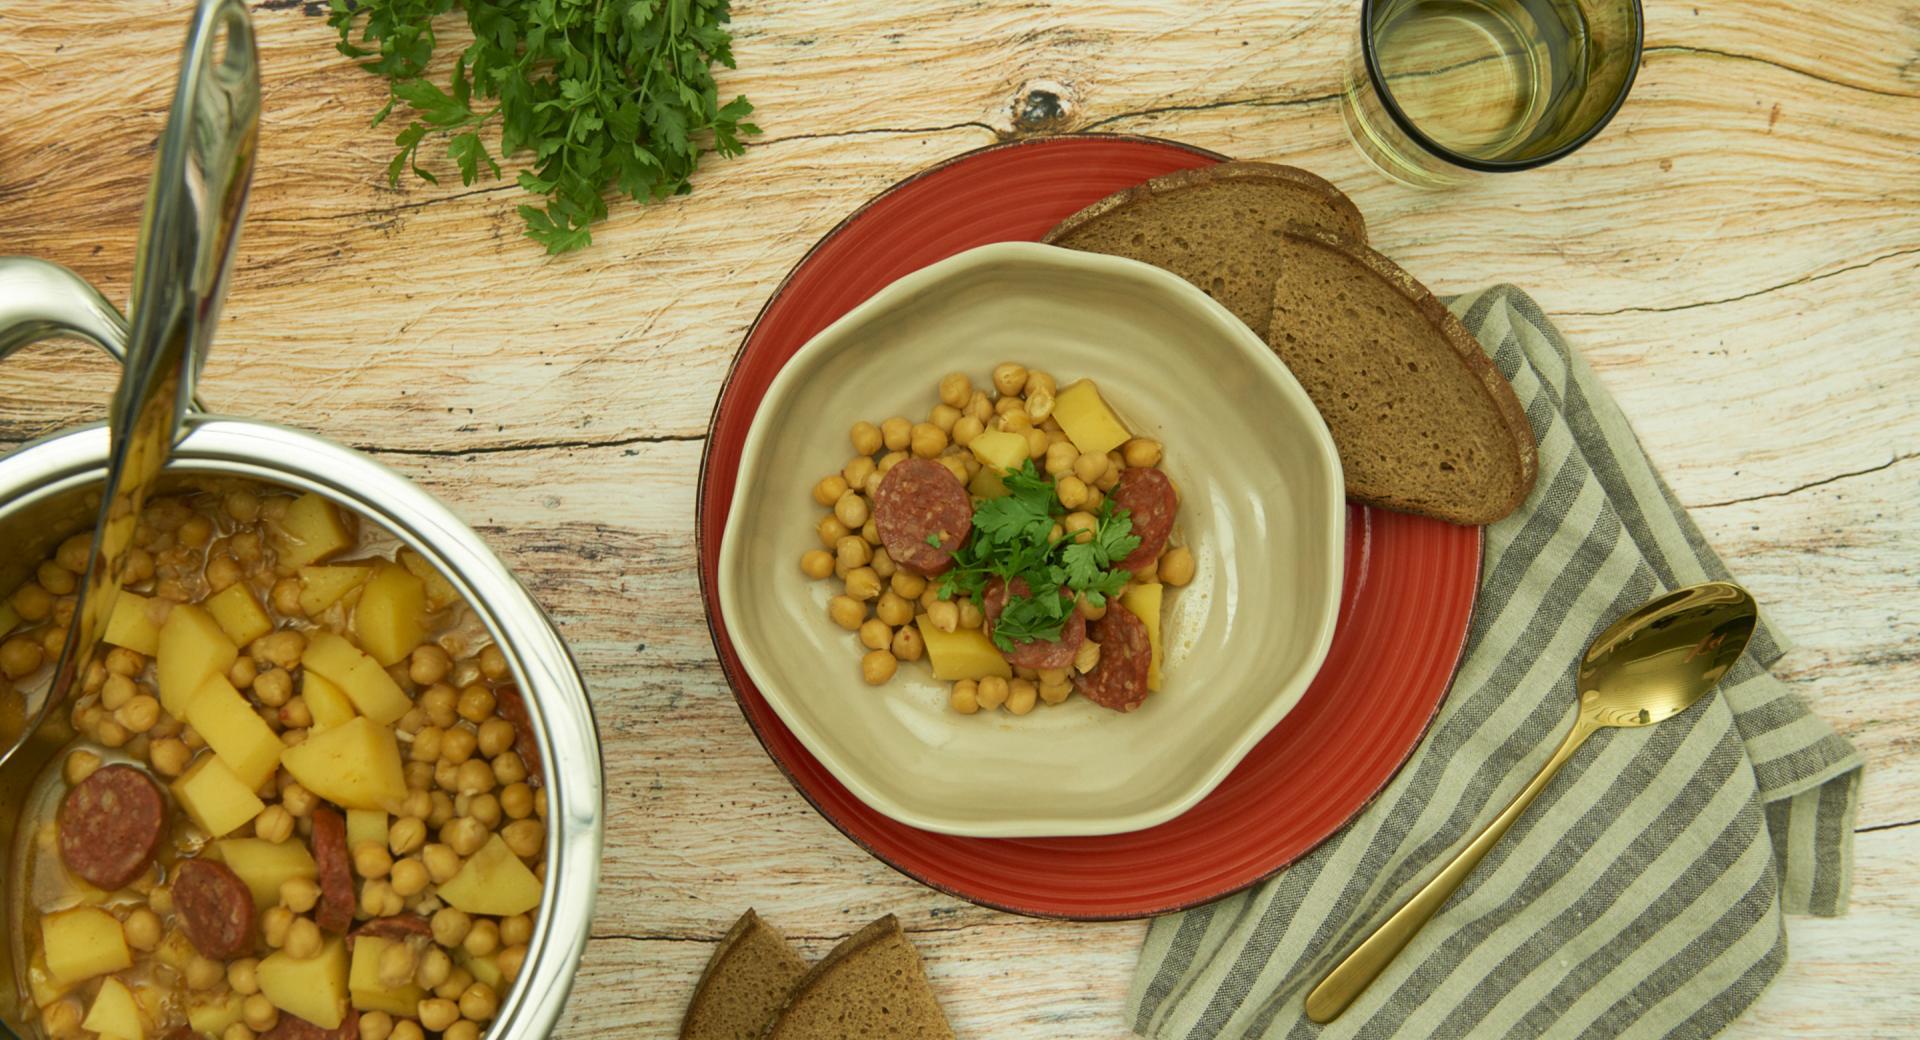 Spanish chickpea stew